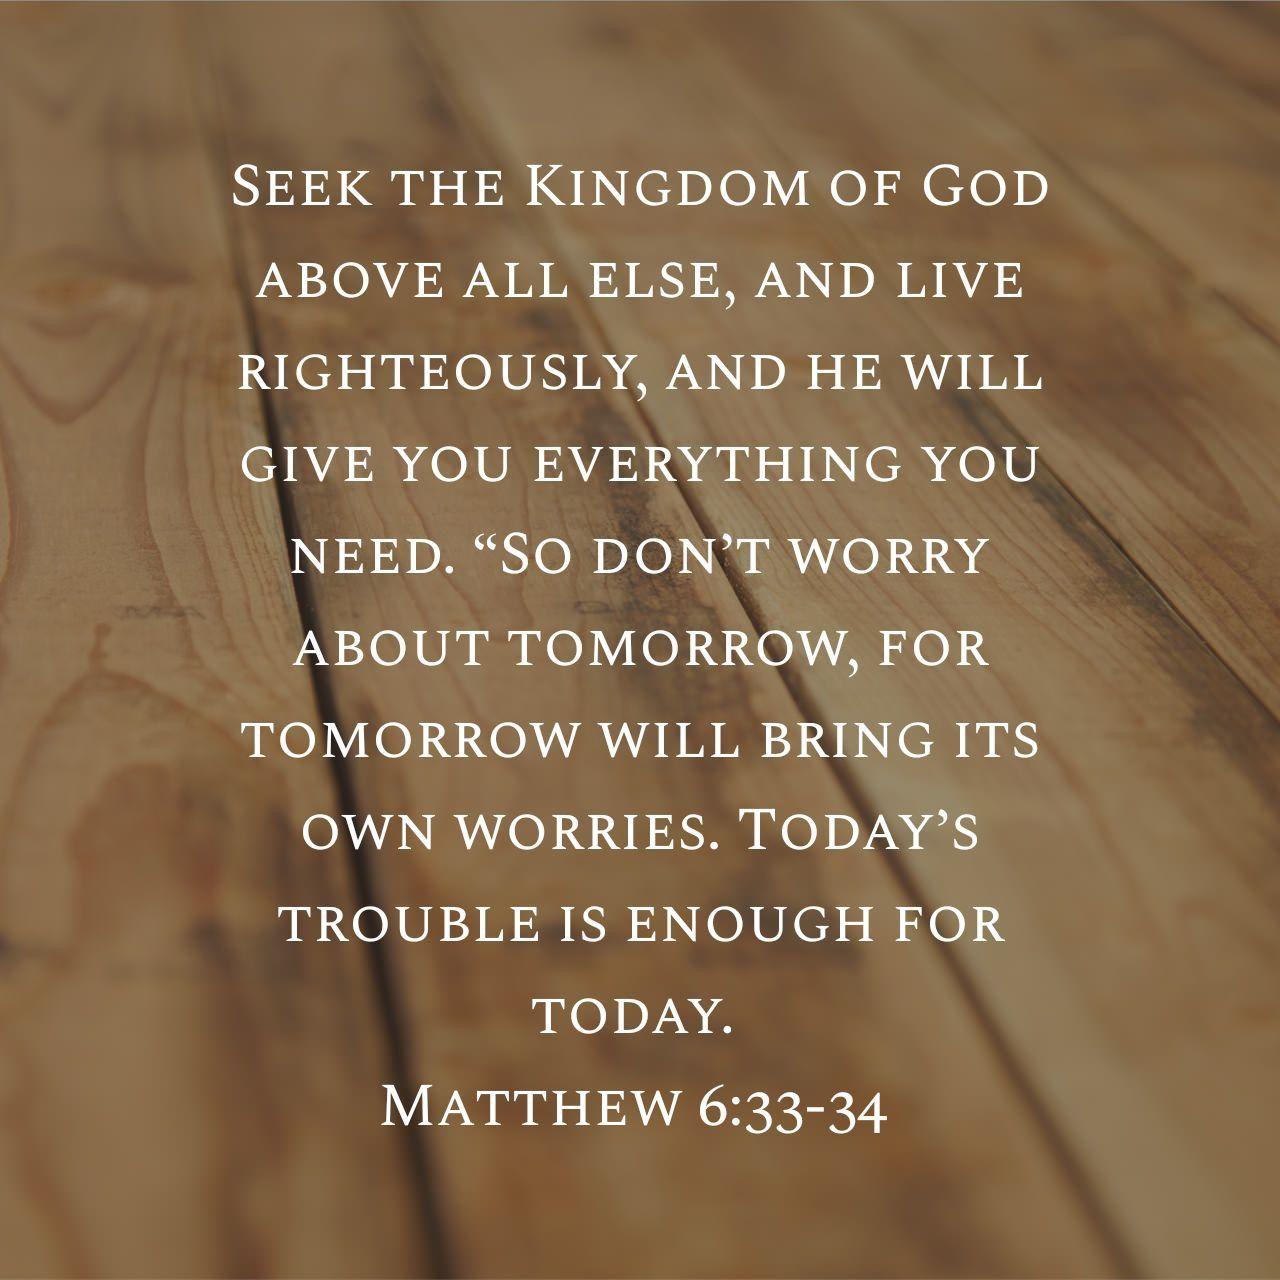 Matthew 6:33-34 | Bible apps, Matthew 6 33-34, Bible